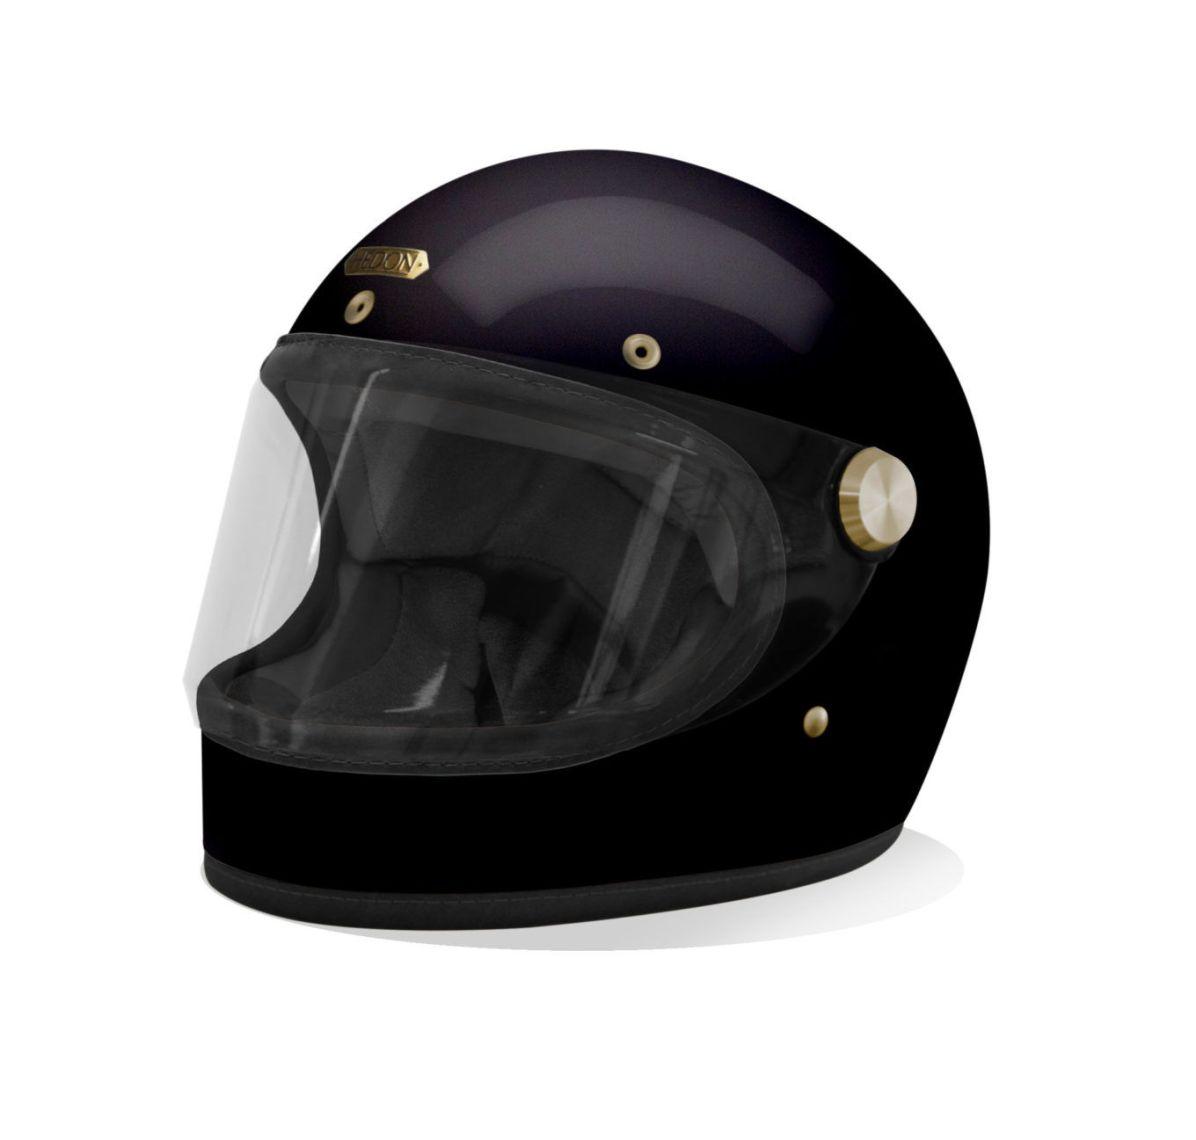 HEDON HEROINE RACER SIGNATURE BLACK | CustomBike.cc